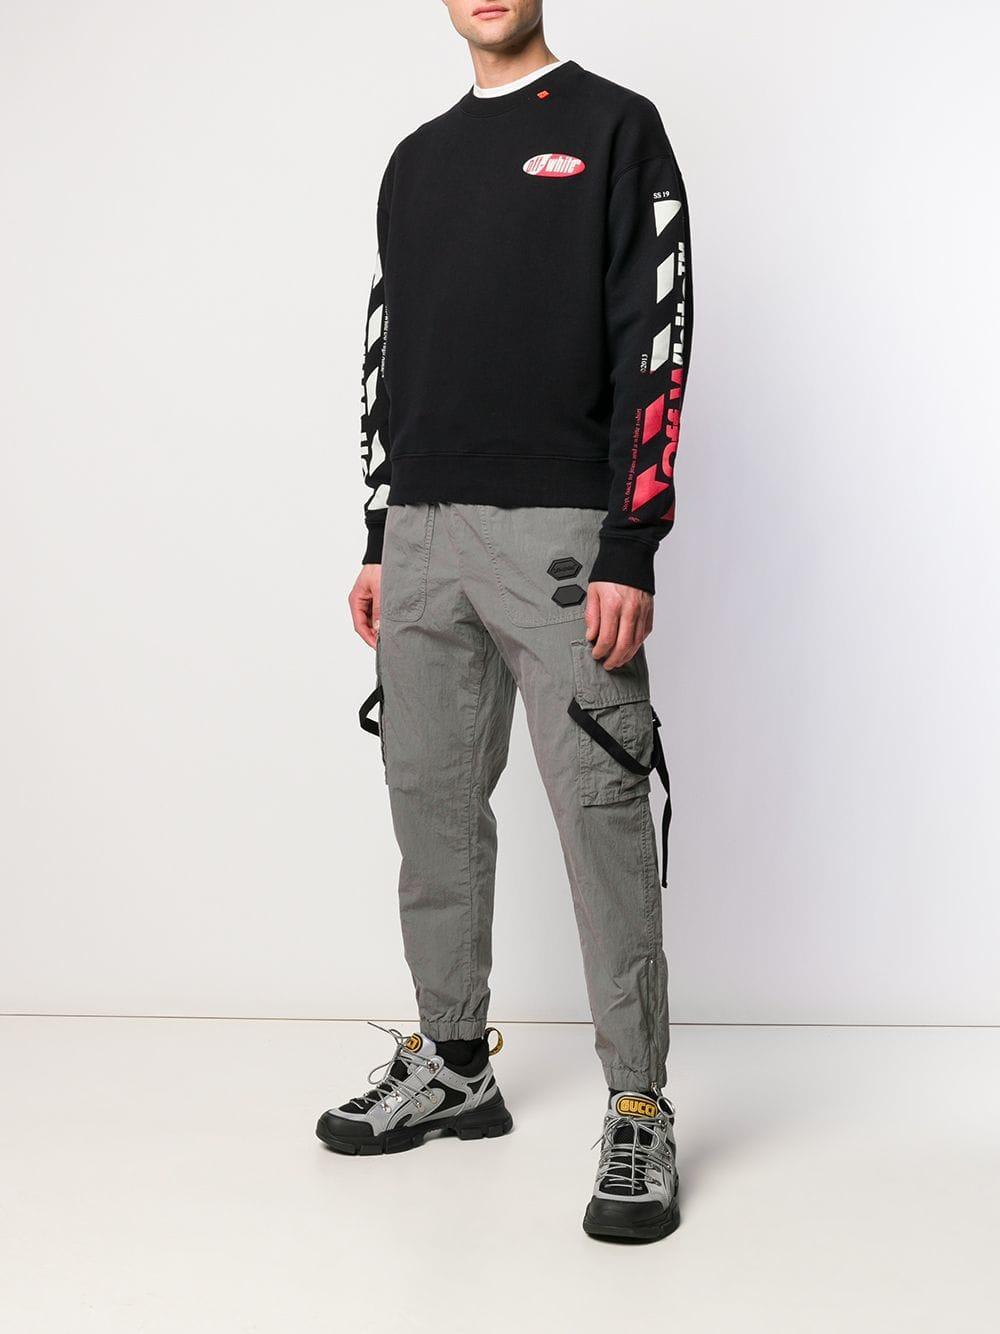 c5d3cf7e8a08 Lyst - Off-White c o Virgil Abloh Arrow Print Sweatshirt in Black for Men -  Save 35%